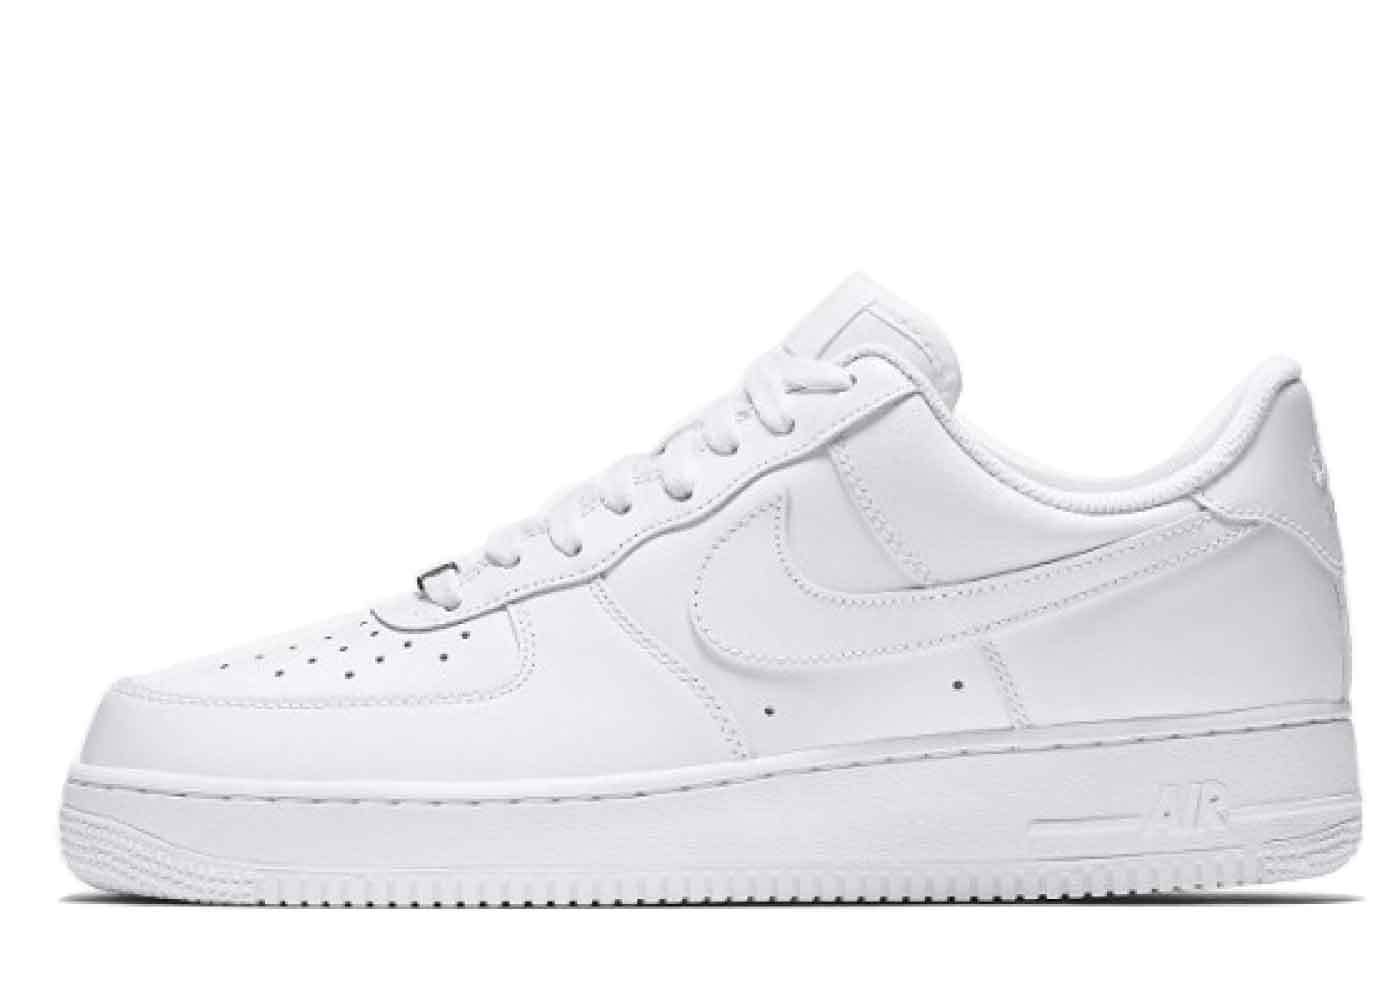 Nike Air Force 1 Low 07 White (CW2288-111)の写真